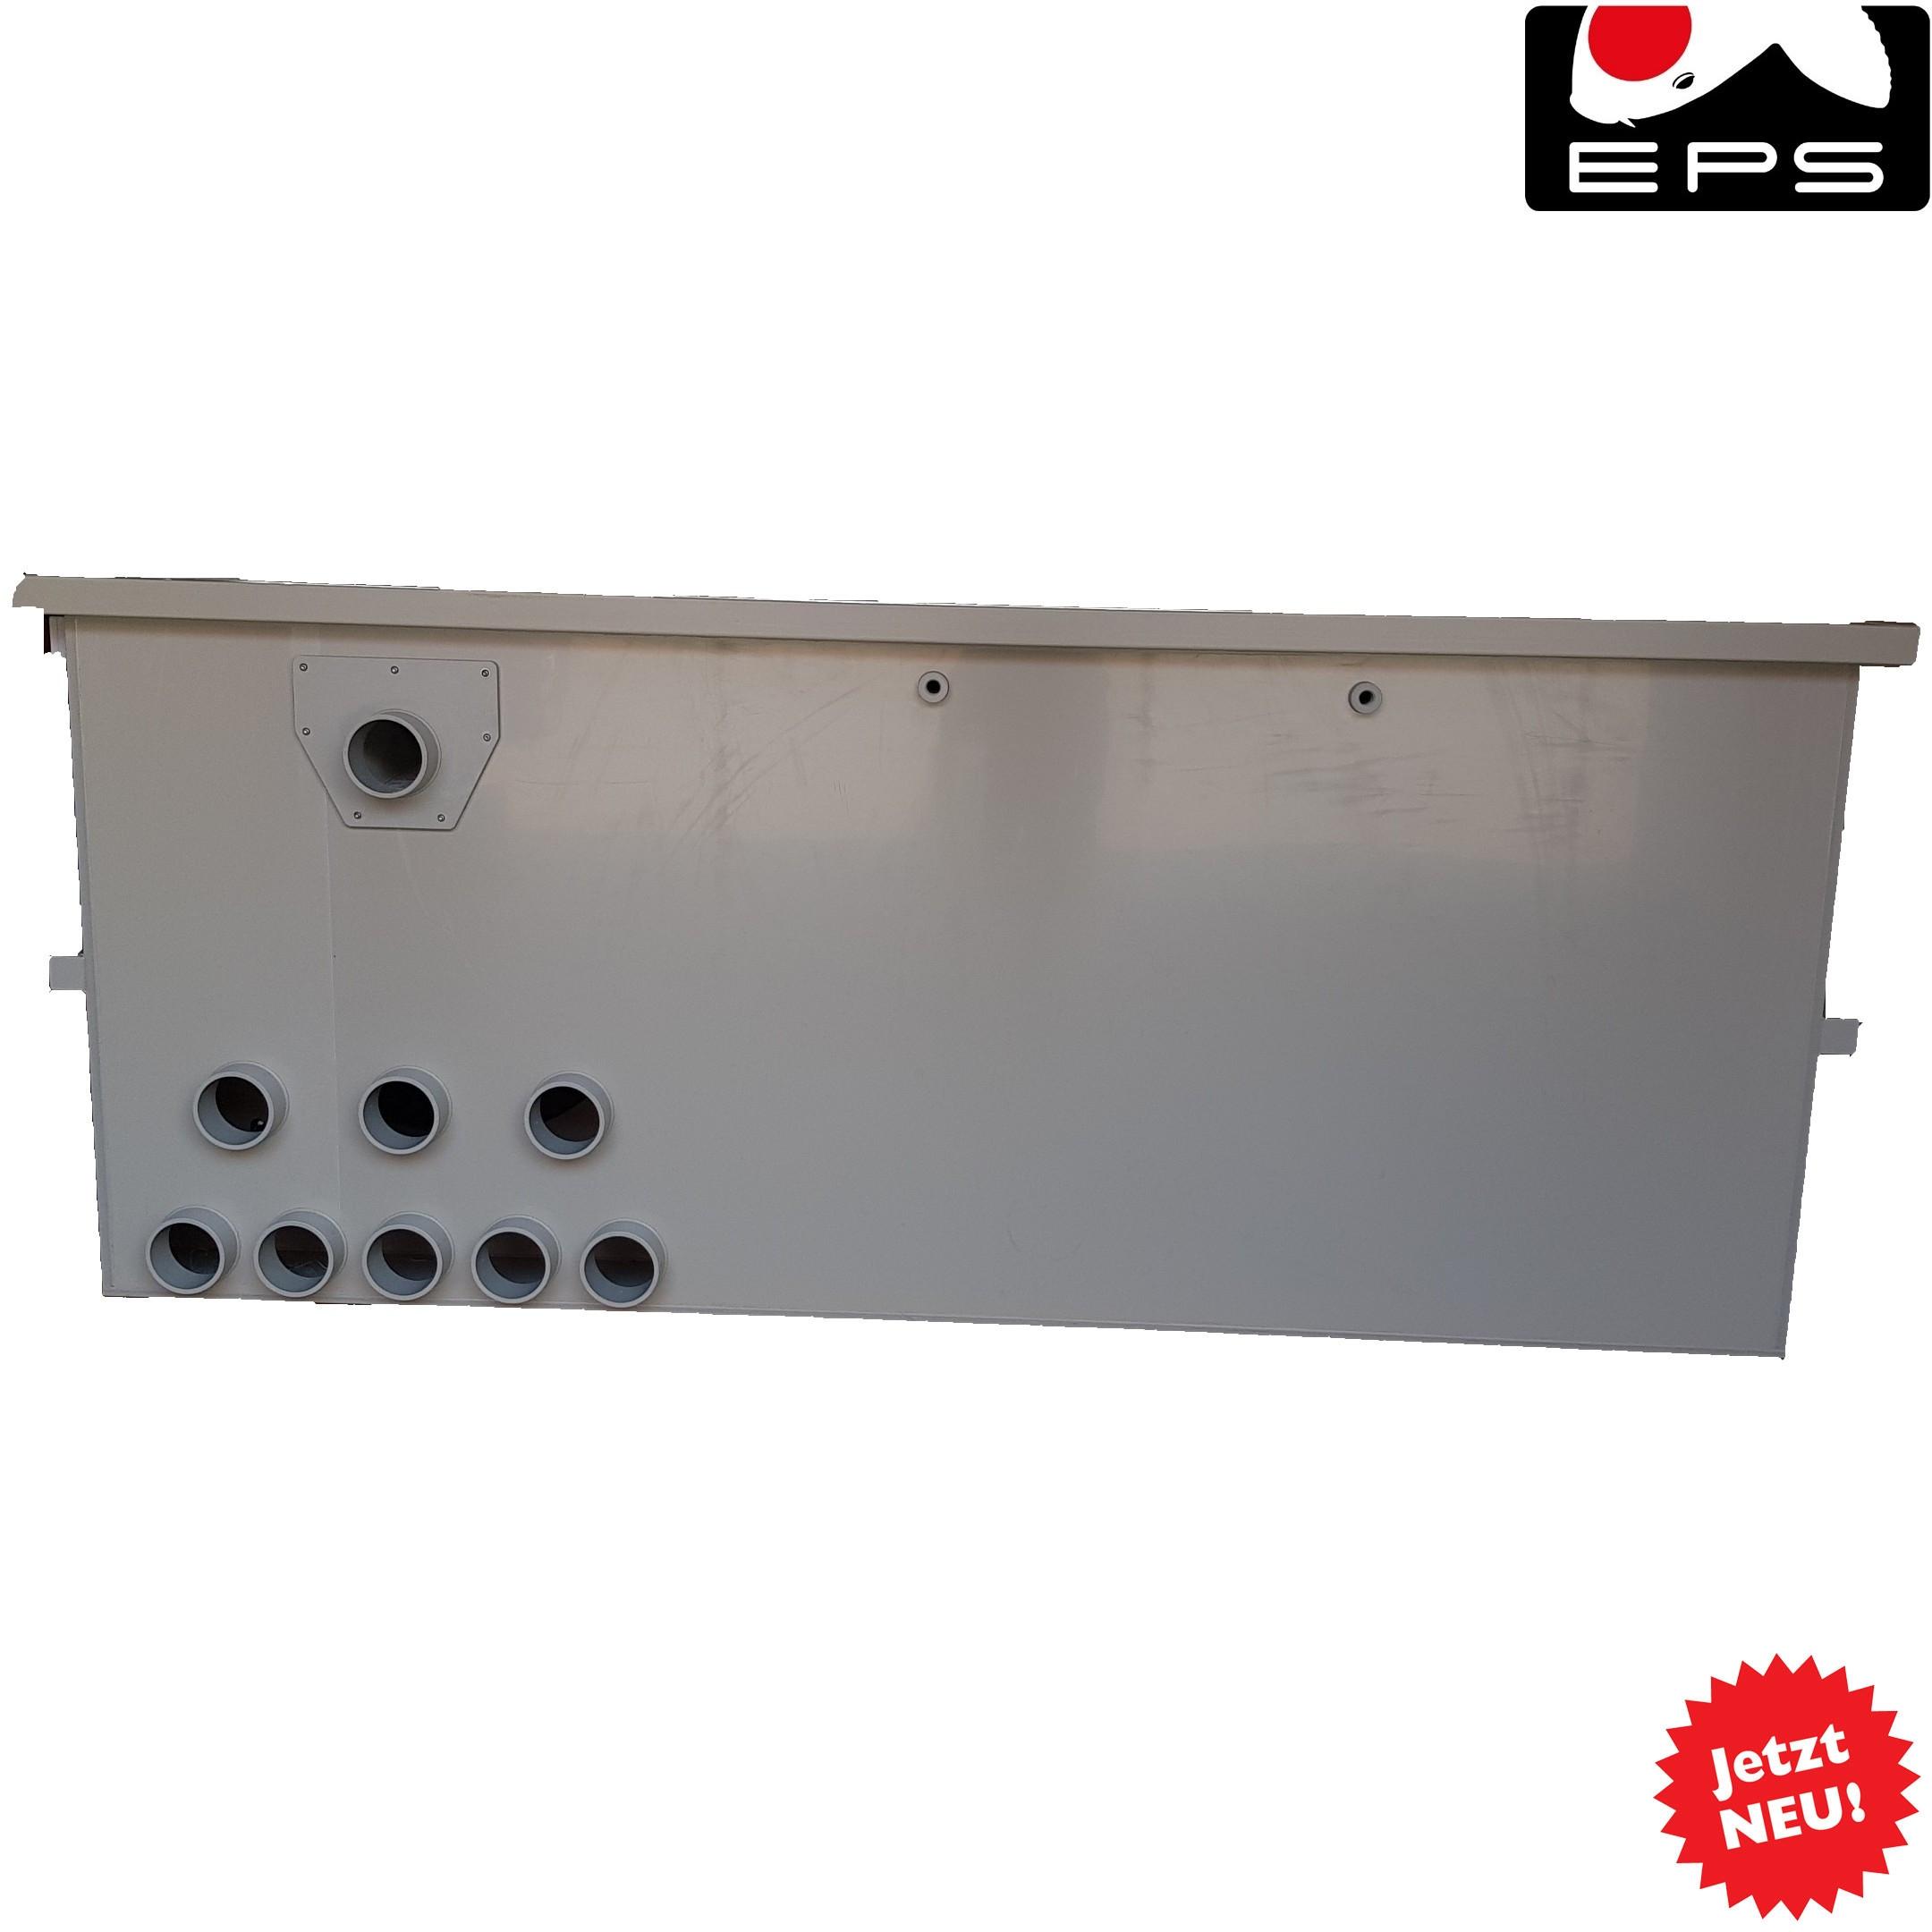 EPS Combi-Trommelfilter CF100 mit integrierter Biokammer + Pumpenkammer